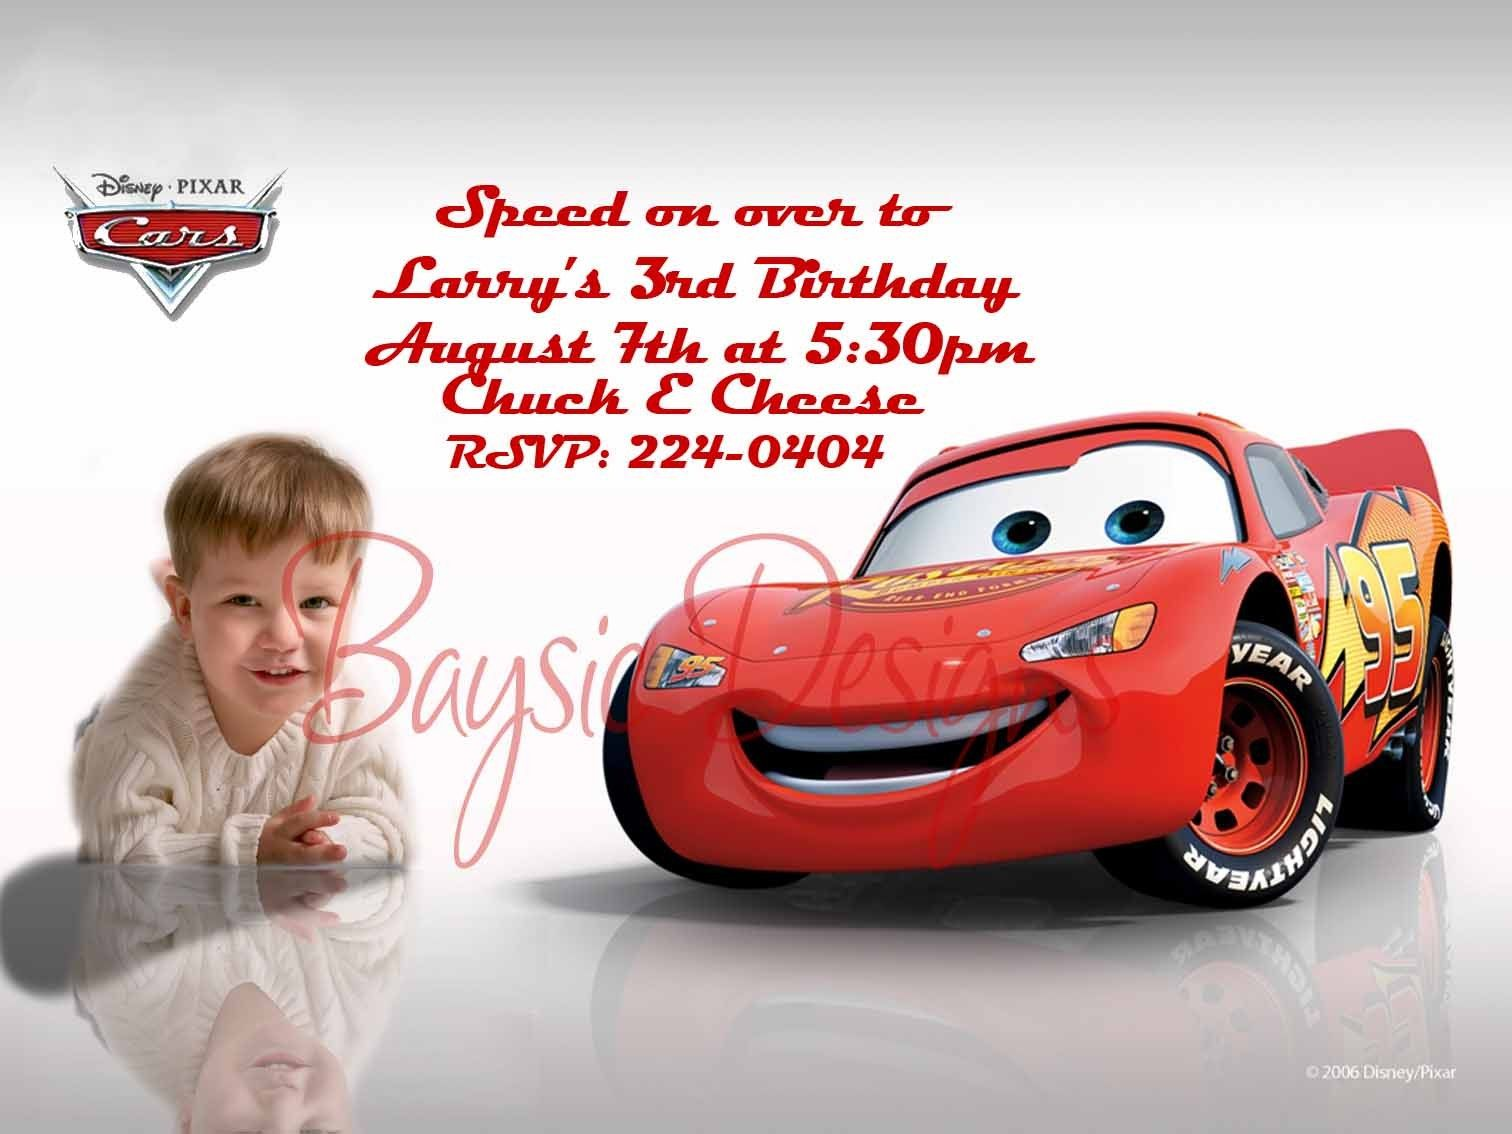 CUSTOM DISNEY CARS BIRTHDAY INVITATIONS FREE SHIPPING 1999 via